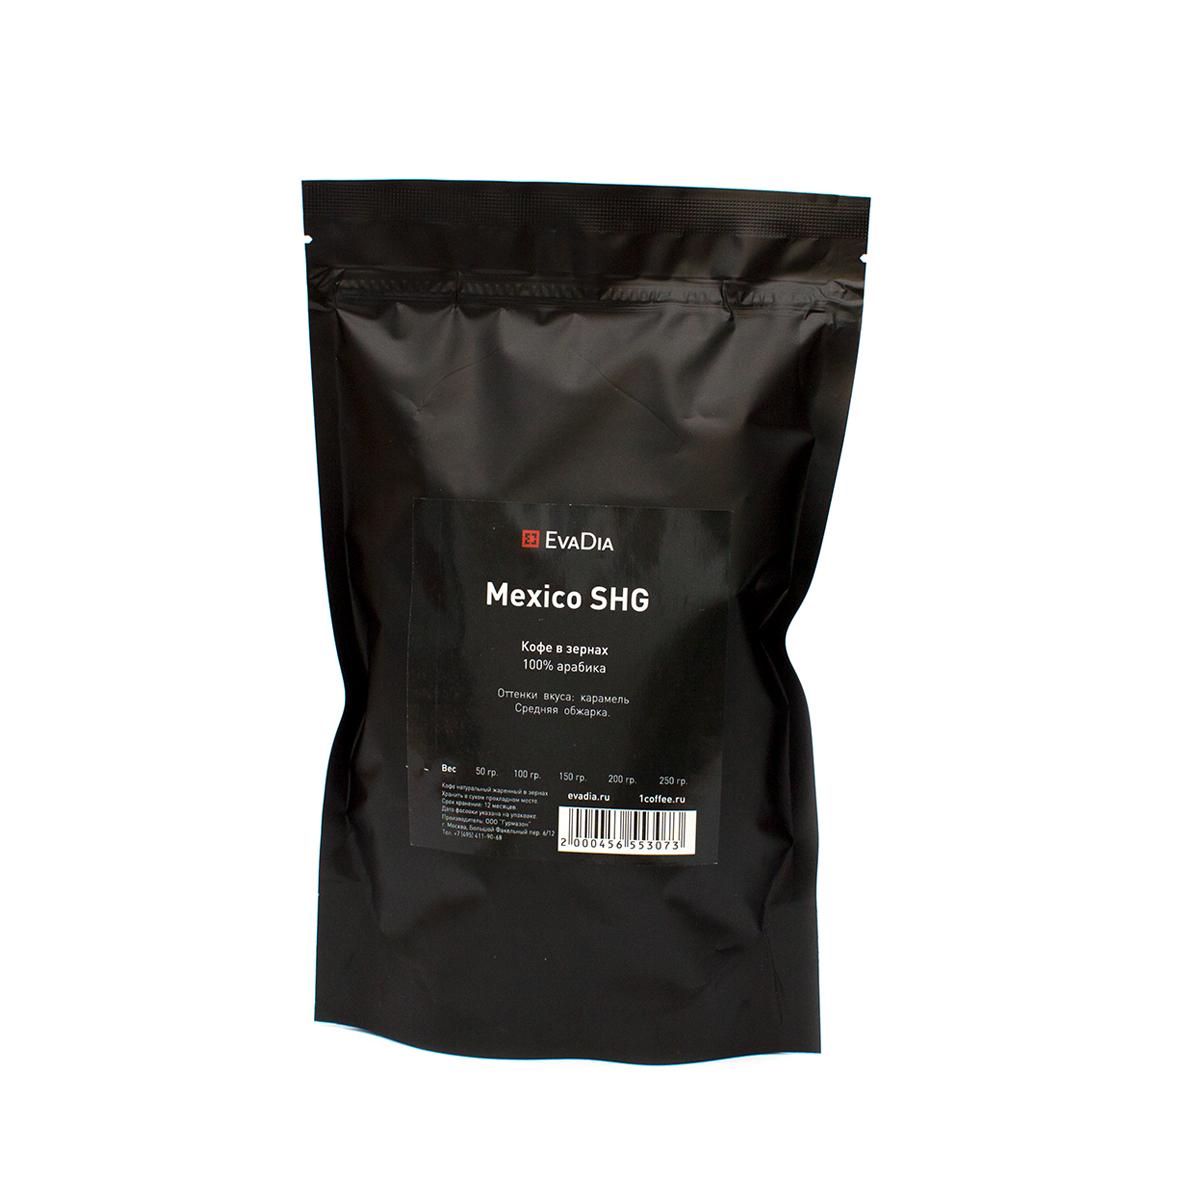 Кофе EvaDia Мексика SHG (Mexico SHG), 250 грамм